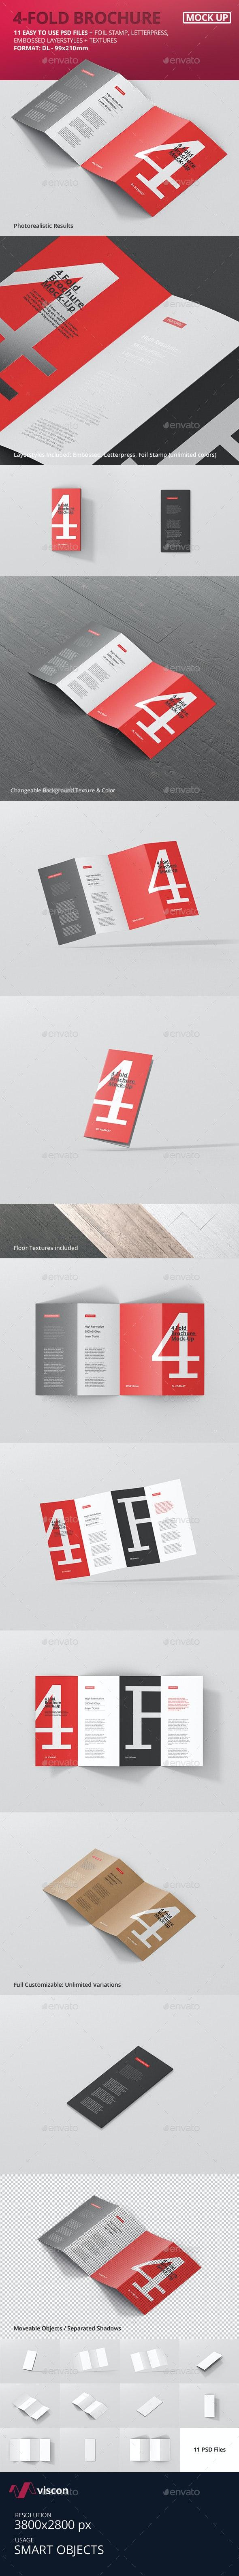 4-Fold Brochure Mockup - DL 99x210mm - Brochures Print